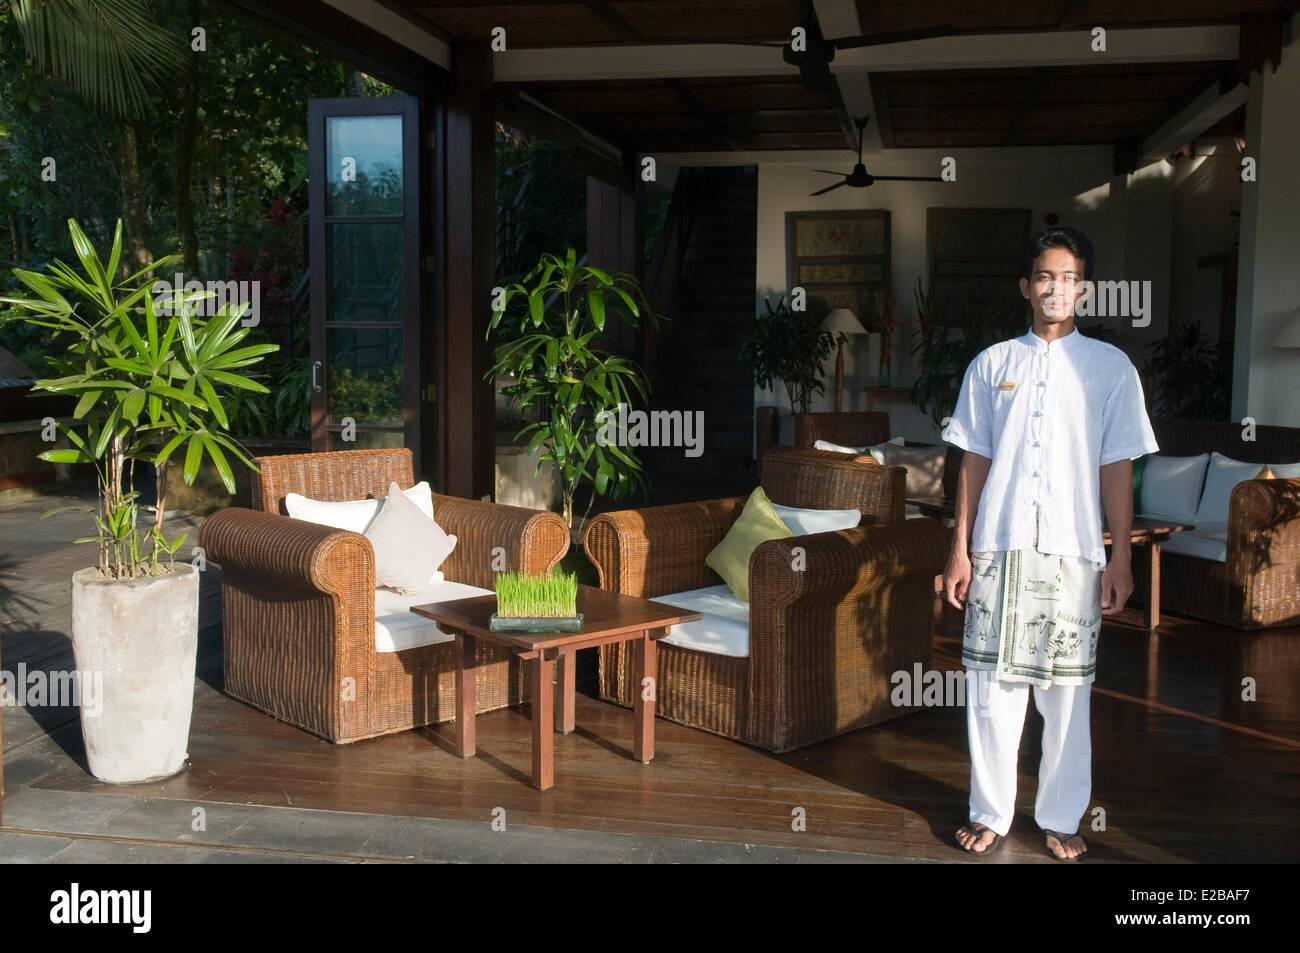 Indonesia, Bali, Gianyar, Buahan Payangan, Ubud Hanging Gardens hotel group Orient Express, server on the terrace - Stock Image